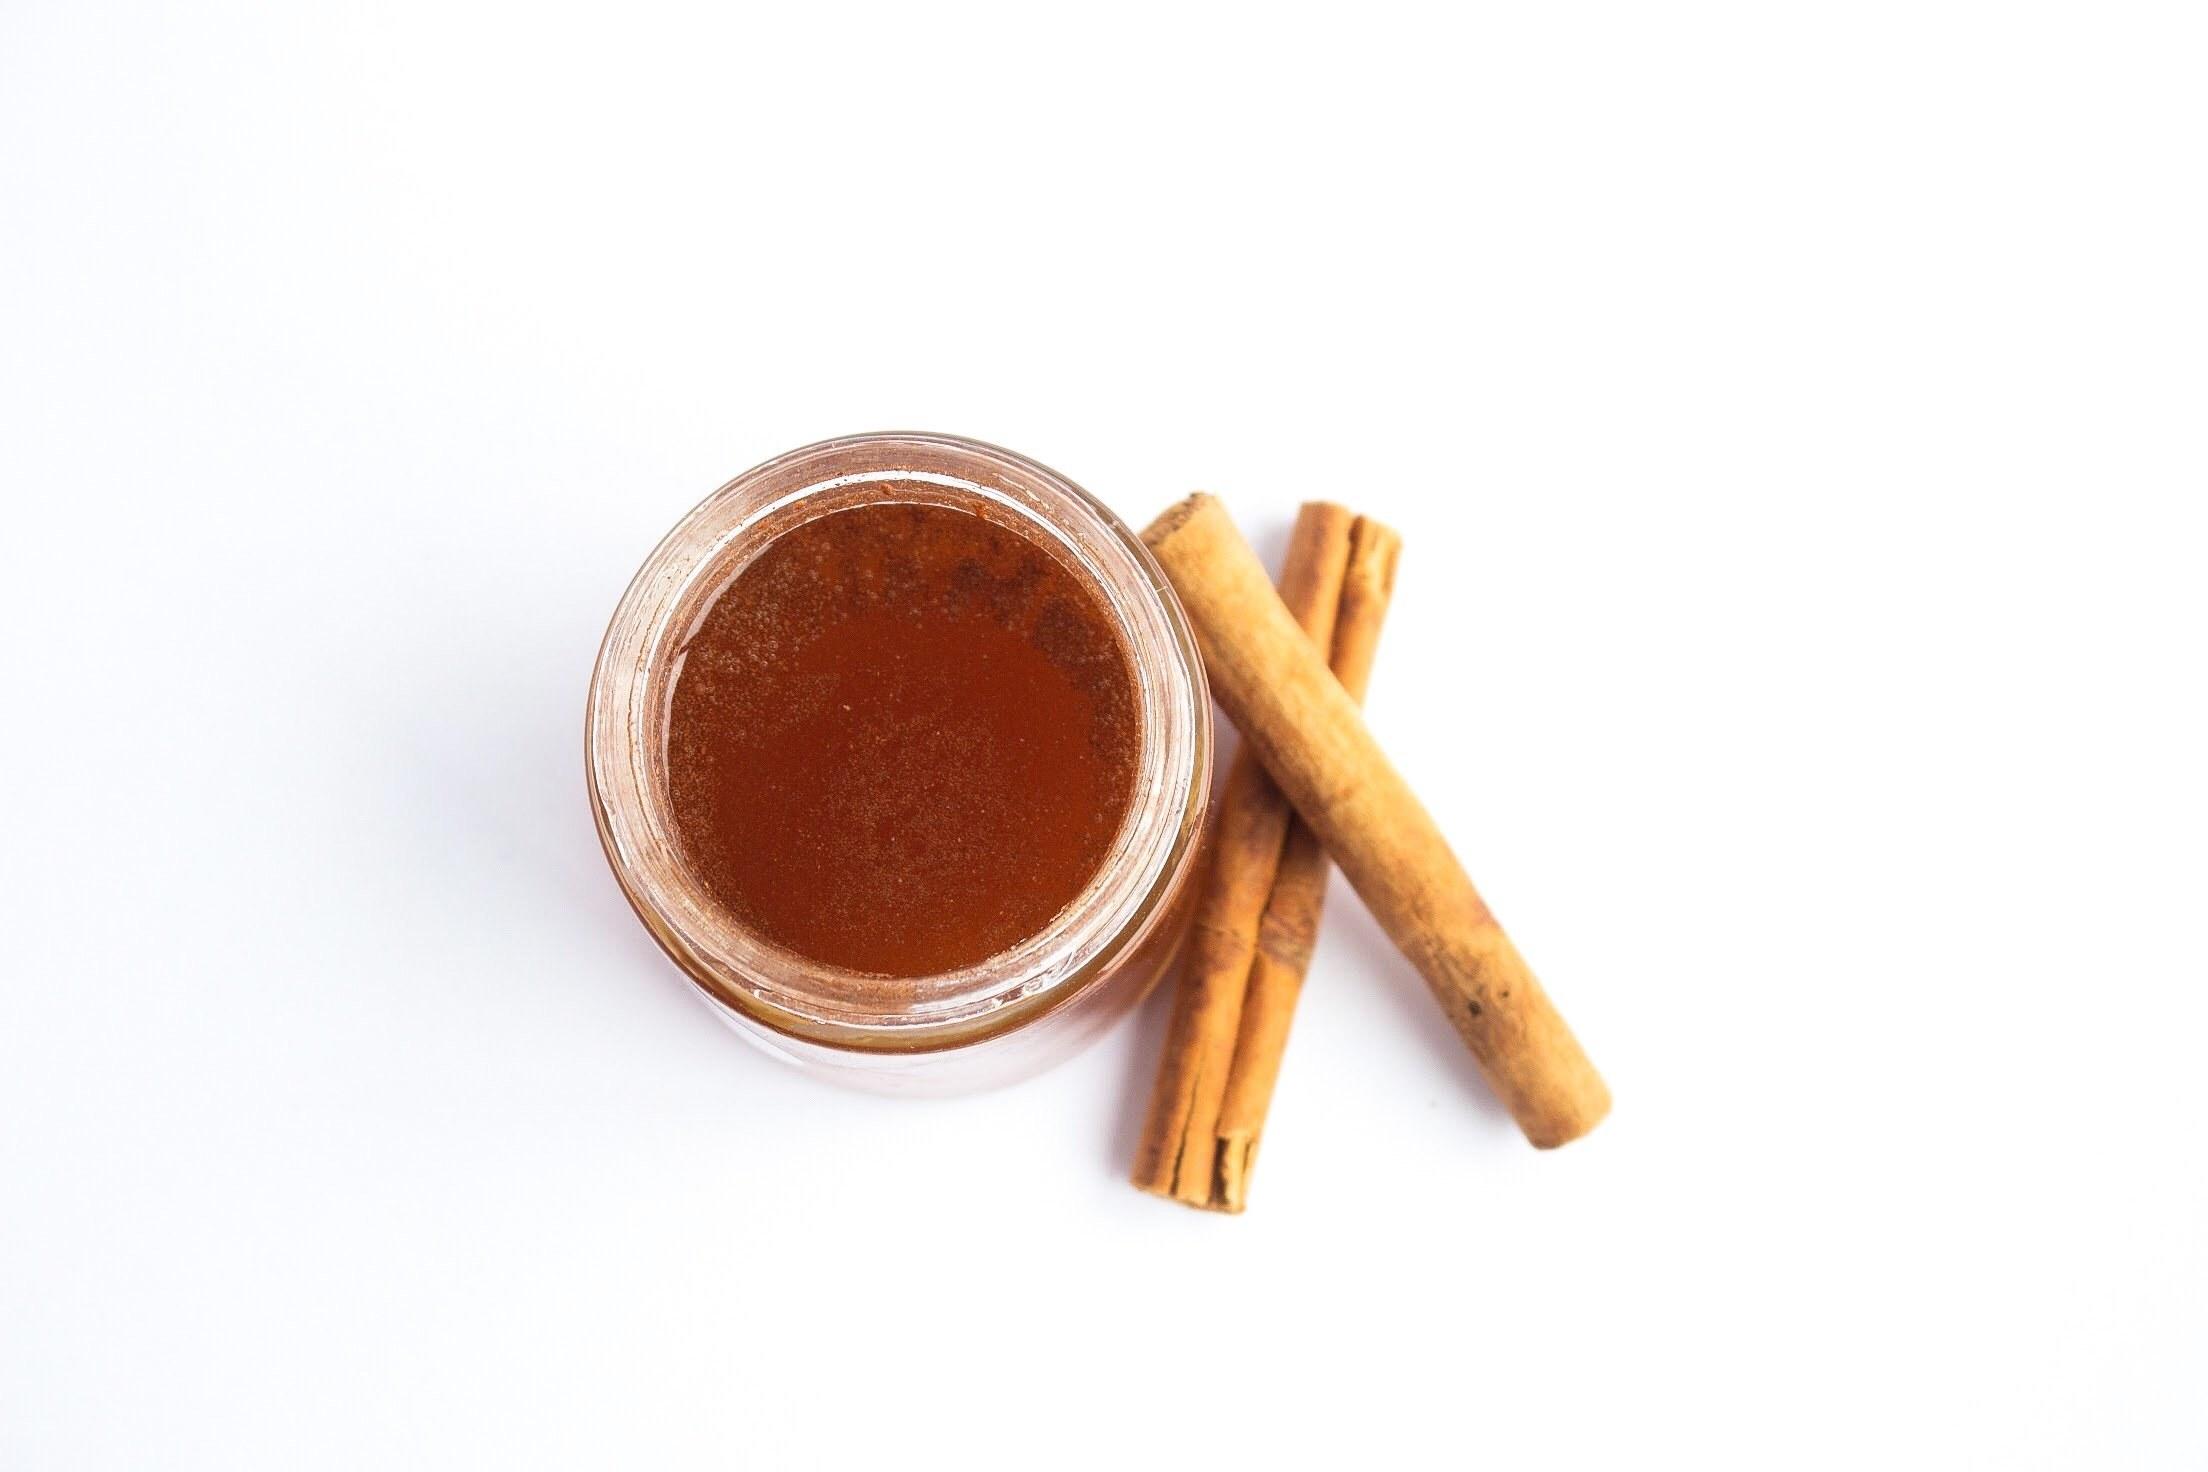 the jar of honey